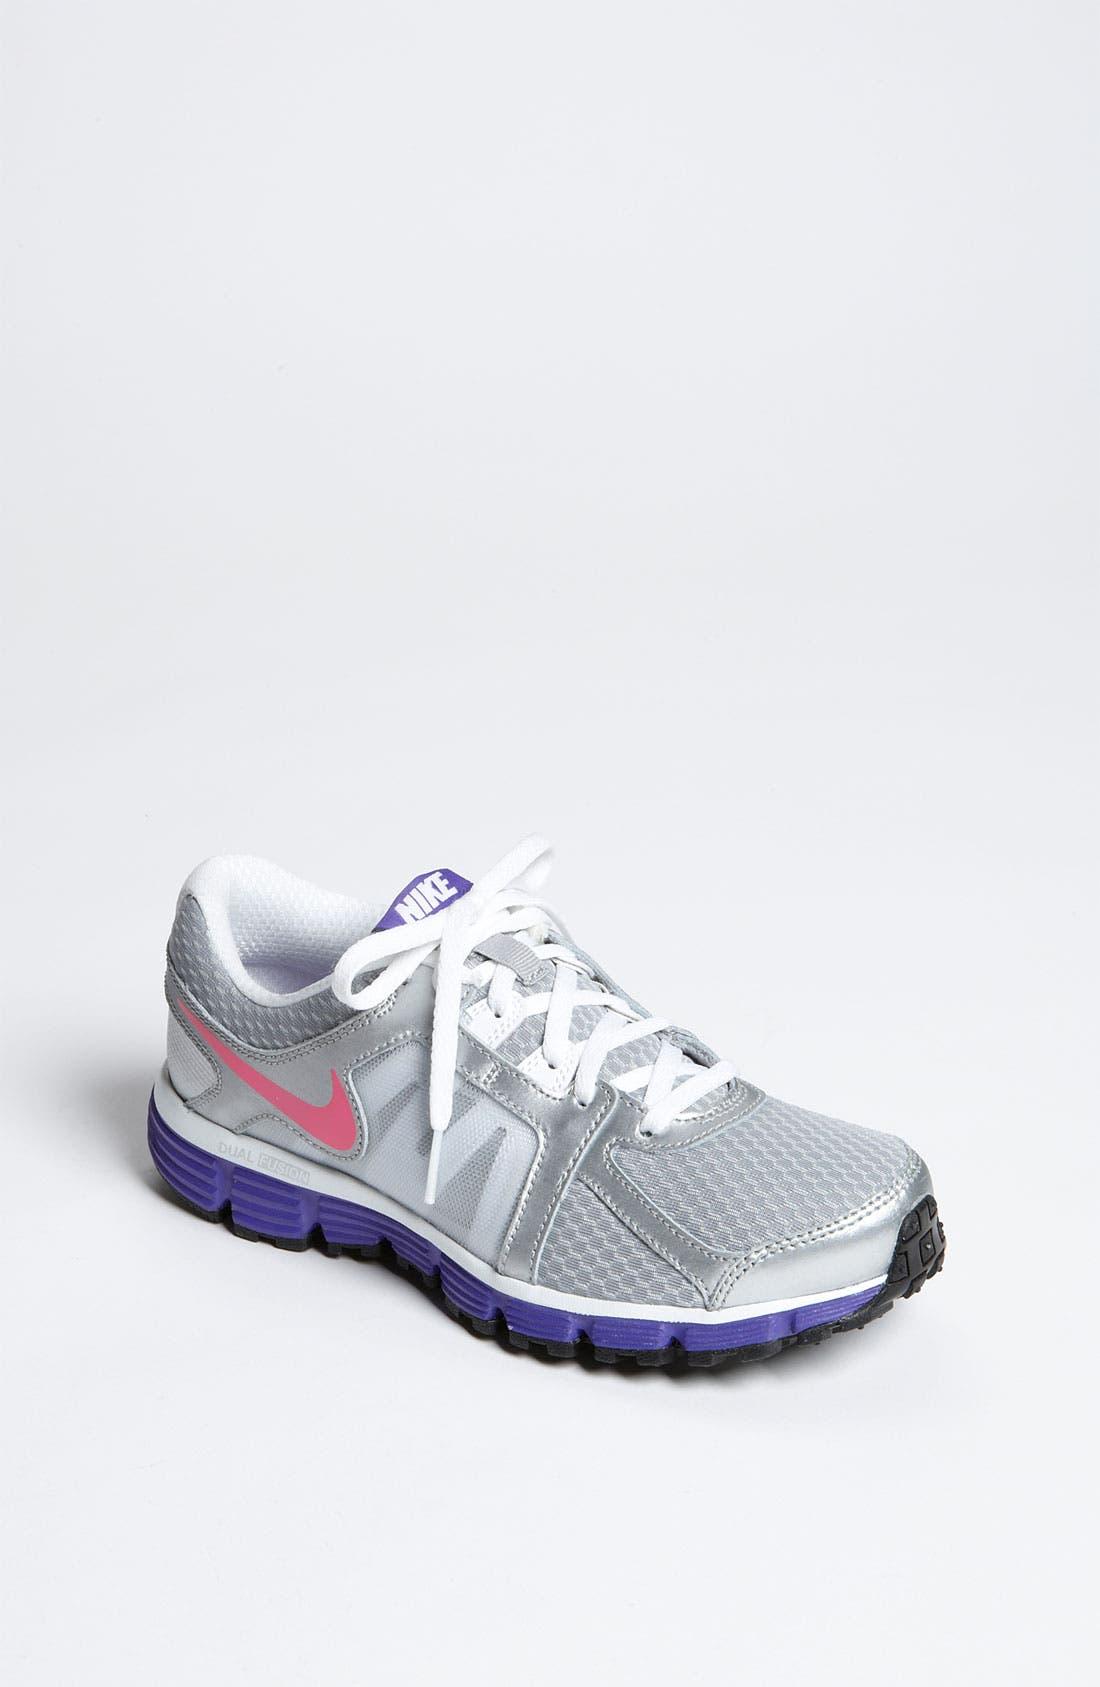 Alternate Image 1 Selected - Nike 'Dual Fusion ST 2' Running Shoe (Toddler, Little Kid & Big Kid)